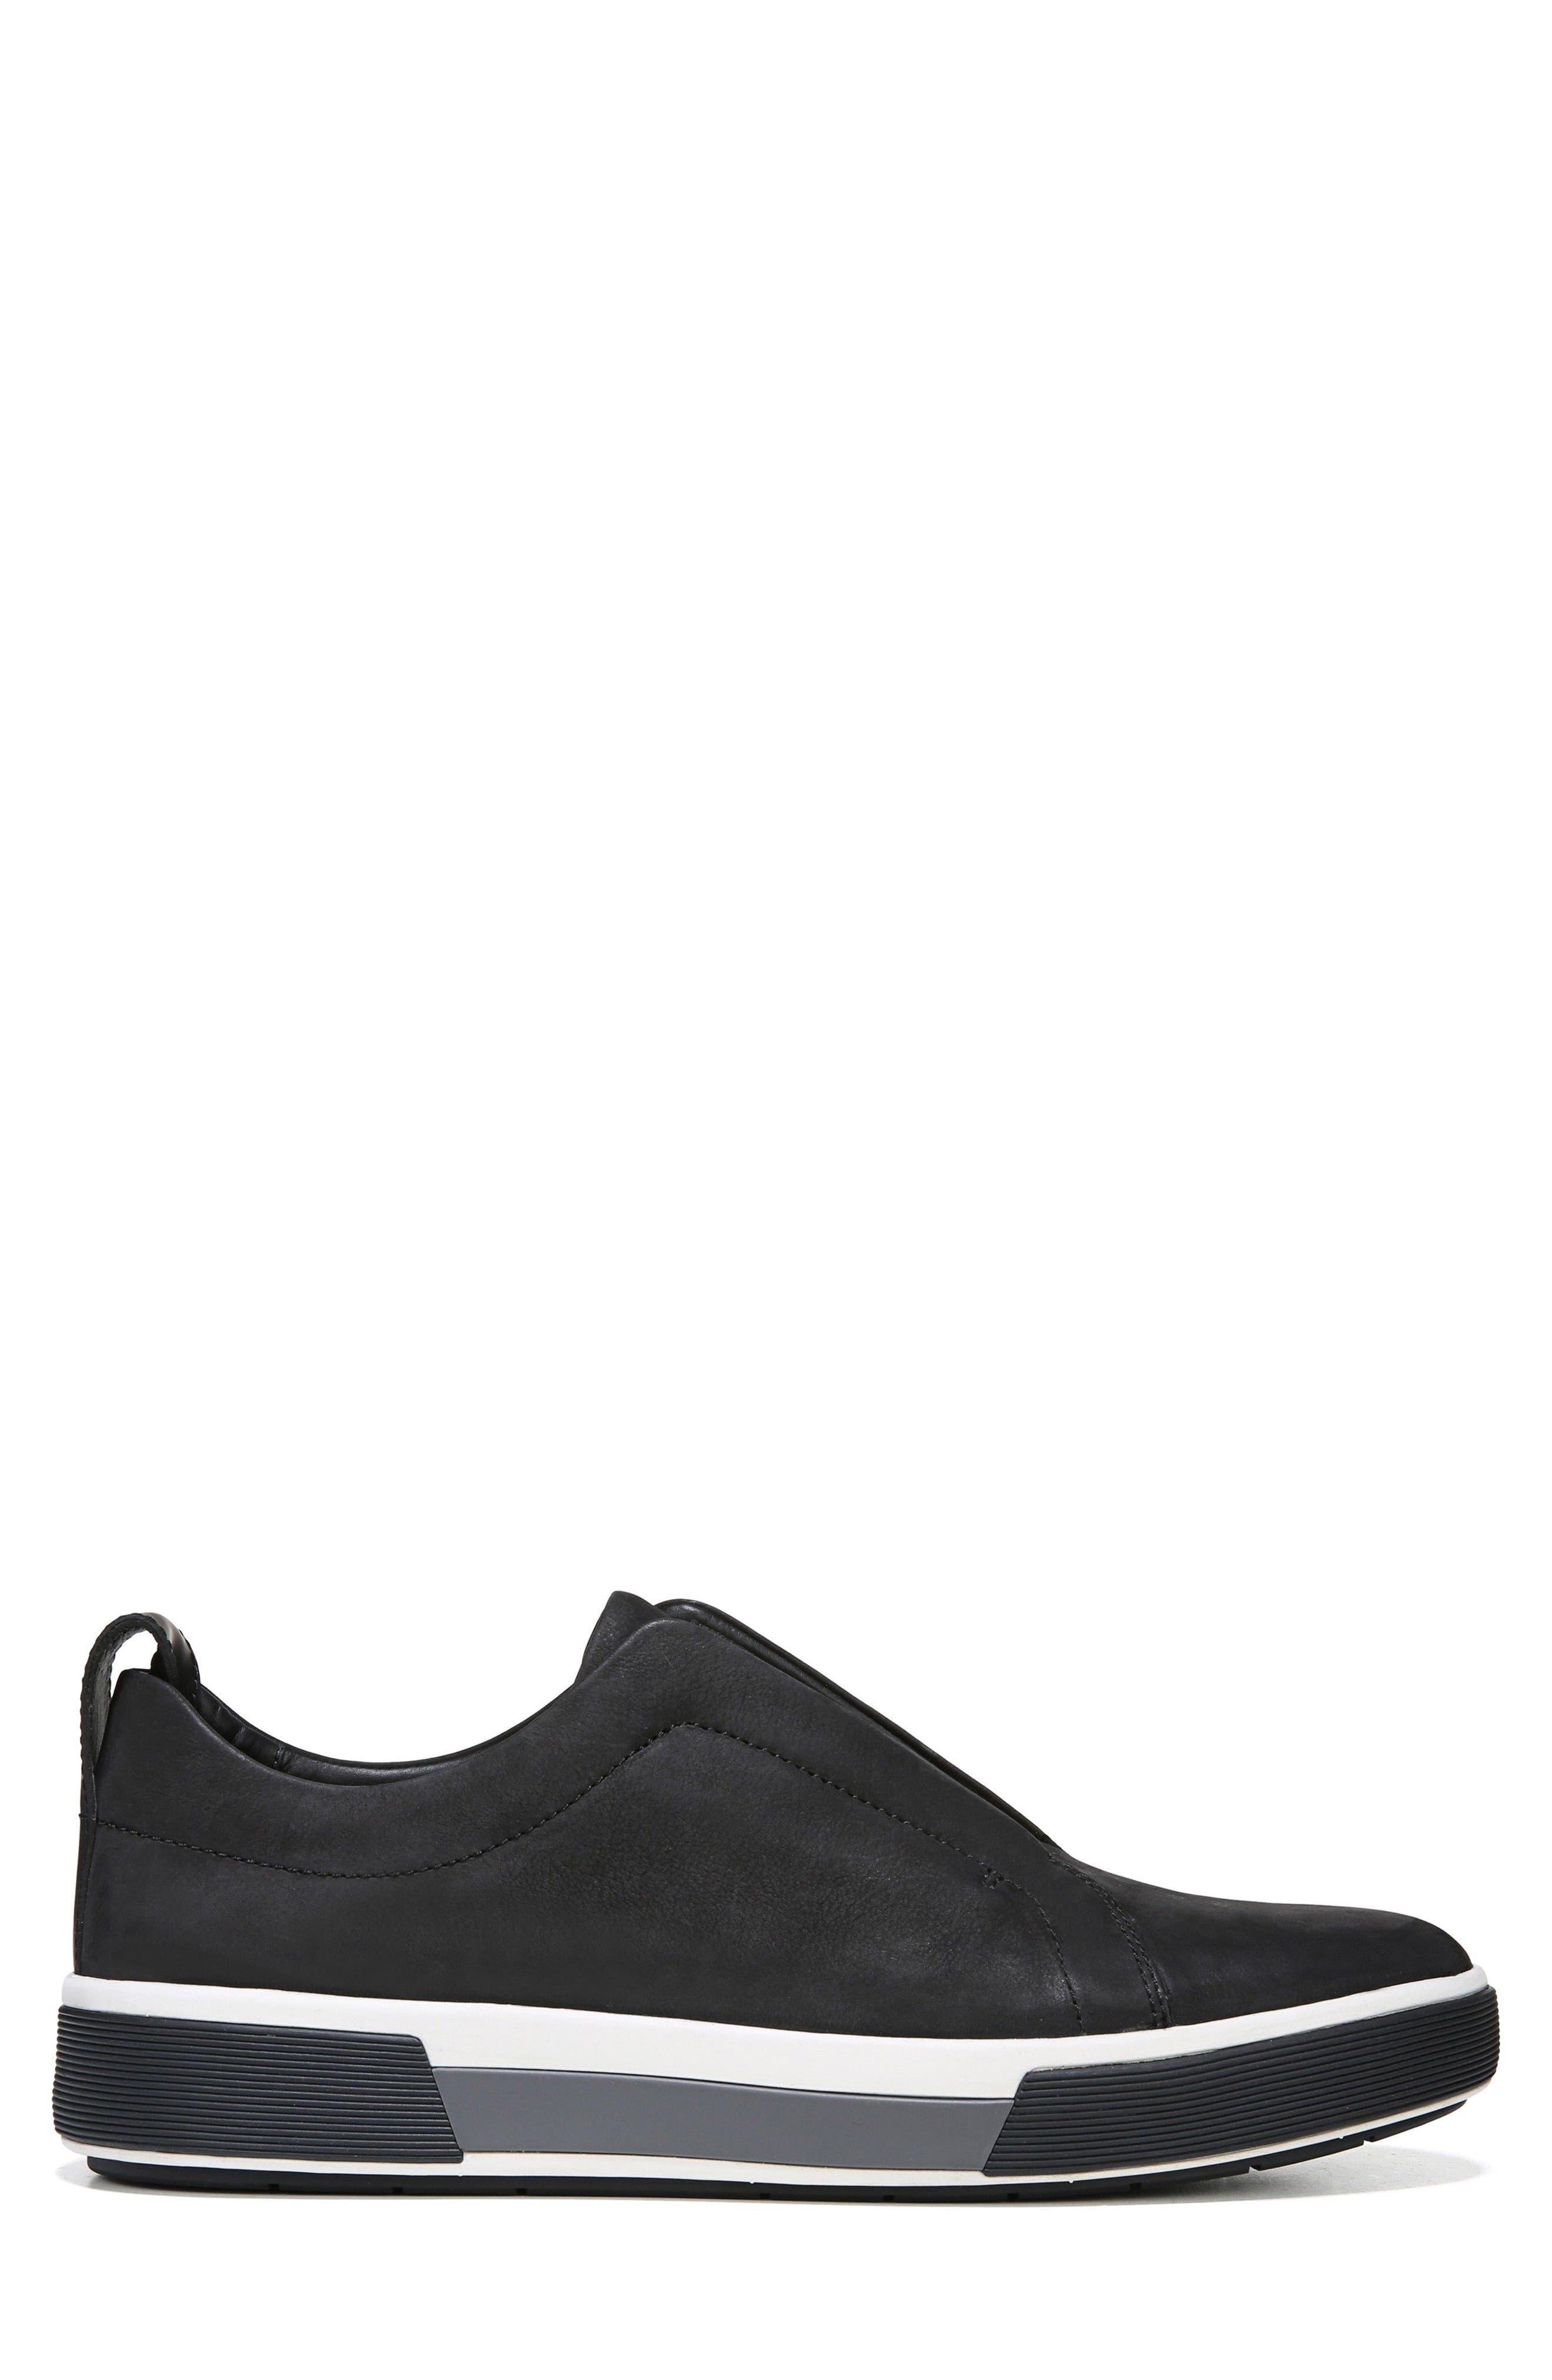 VINCE, Ranger Laceless Sneaker, Alternate thumbnail 3, color, BLACK